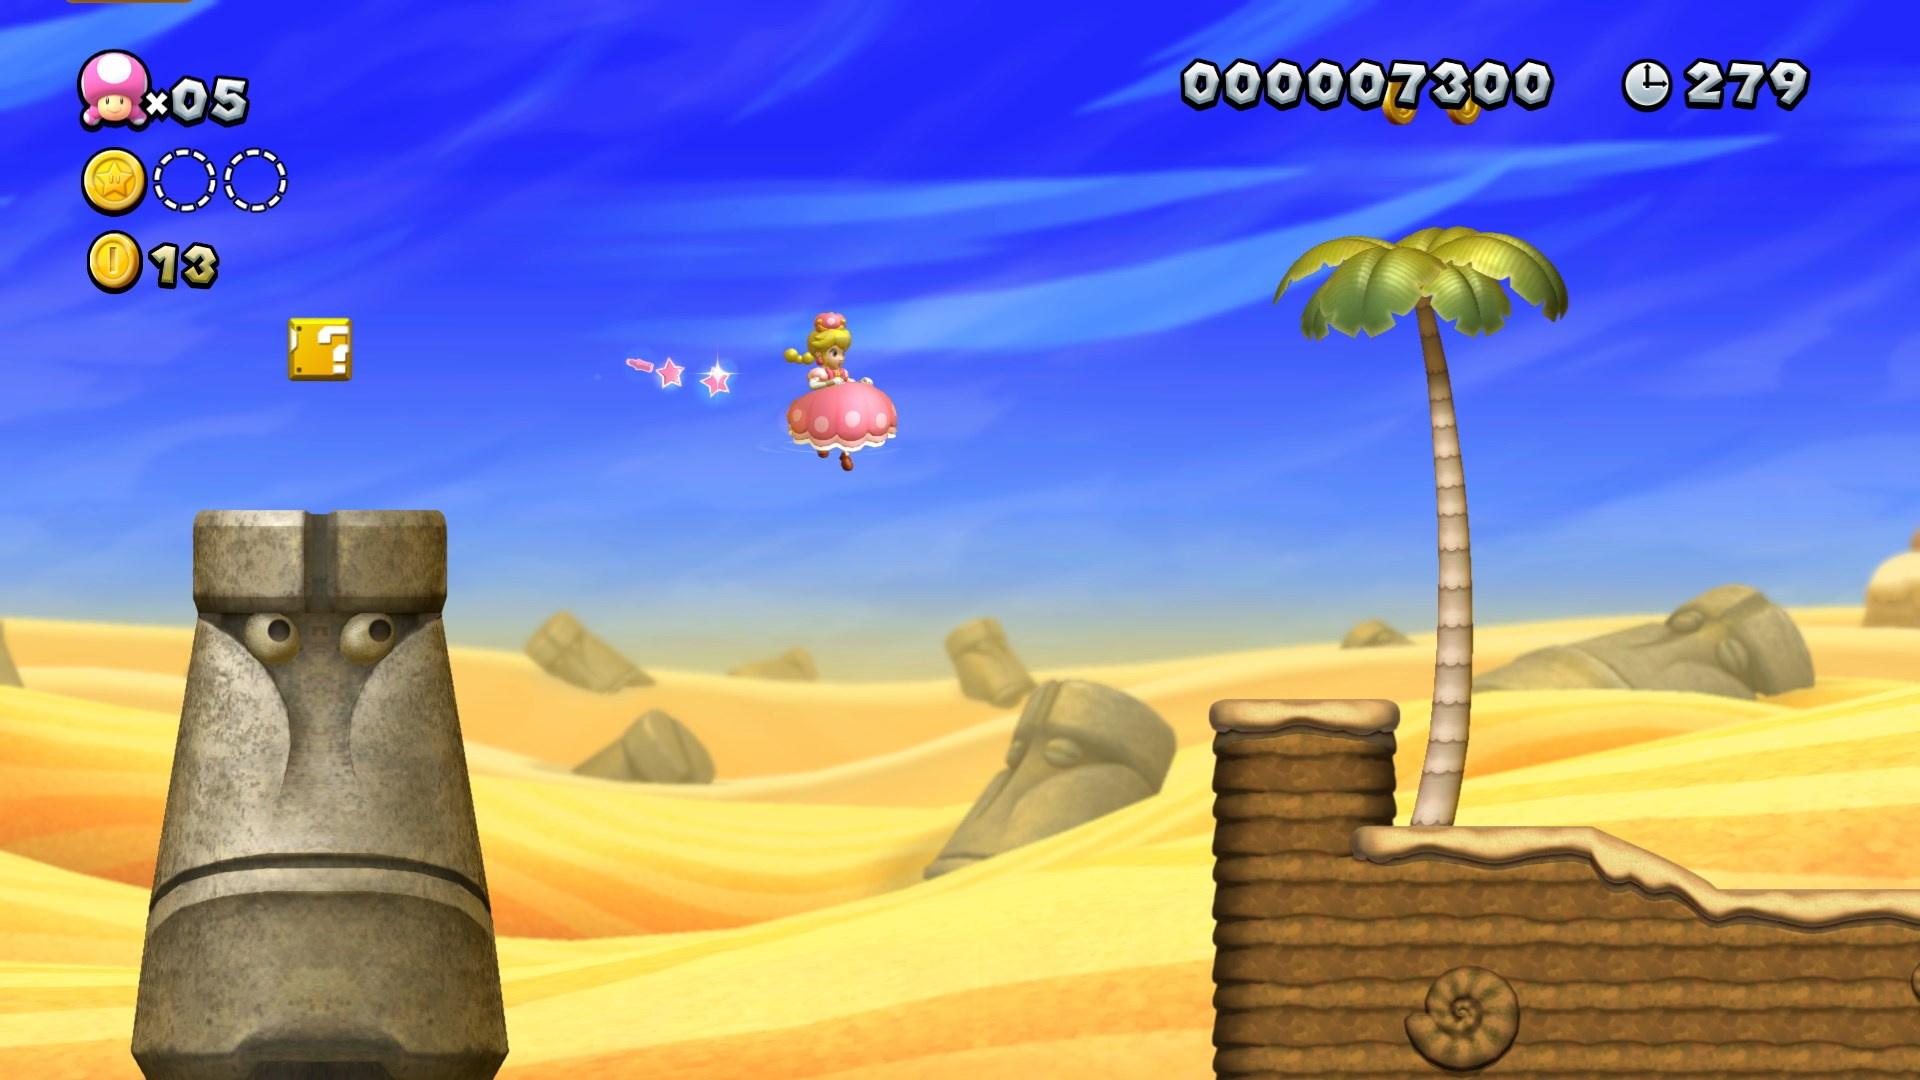 New Super Mario Bros U Deluxe Nintendo Switch Game Profile News Reviews Videos Screenshots